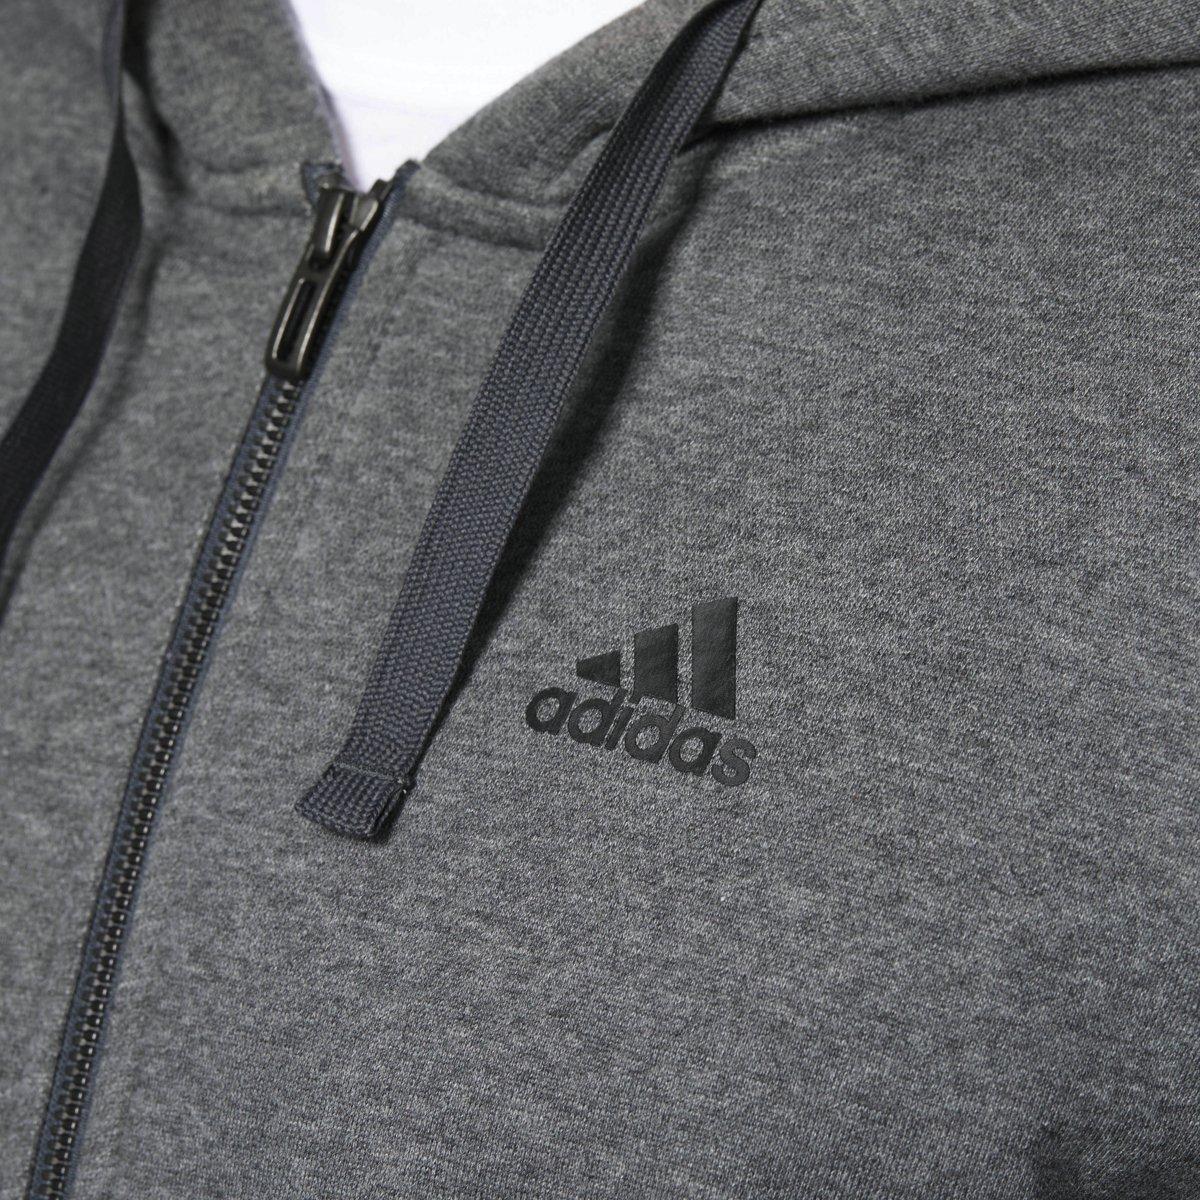 adidas Men's Athletics Essential Cotton 3 Stripe Full Zip Hoody, Dark Grey Heather/Black, 3X-Large